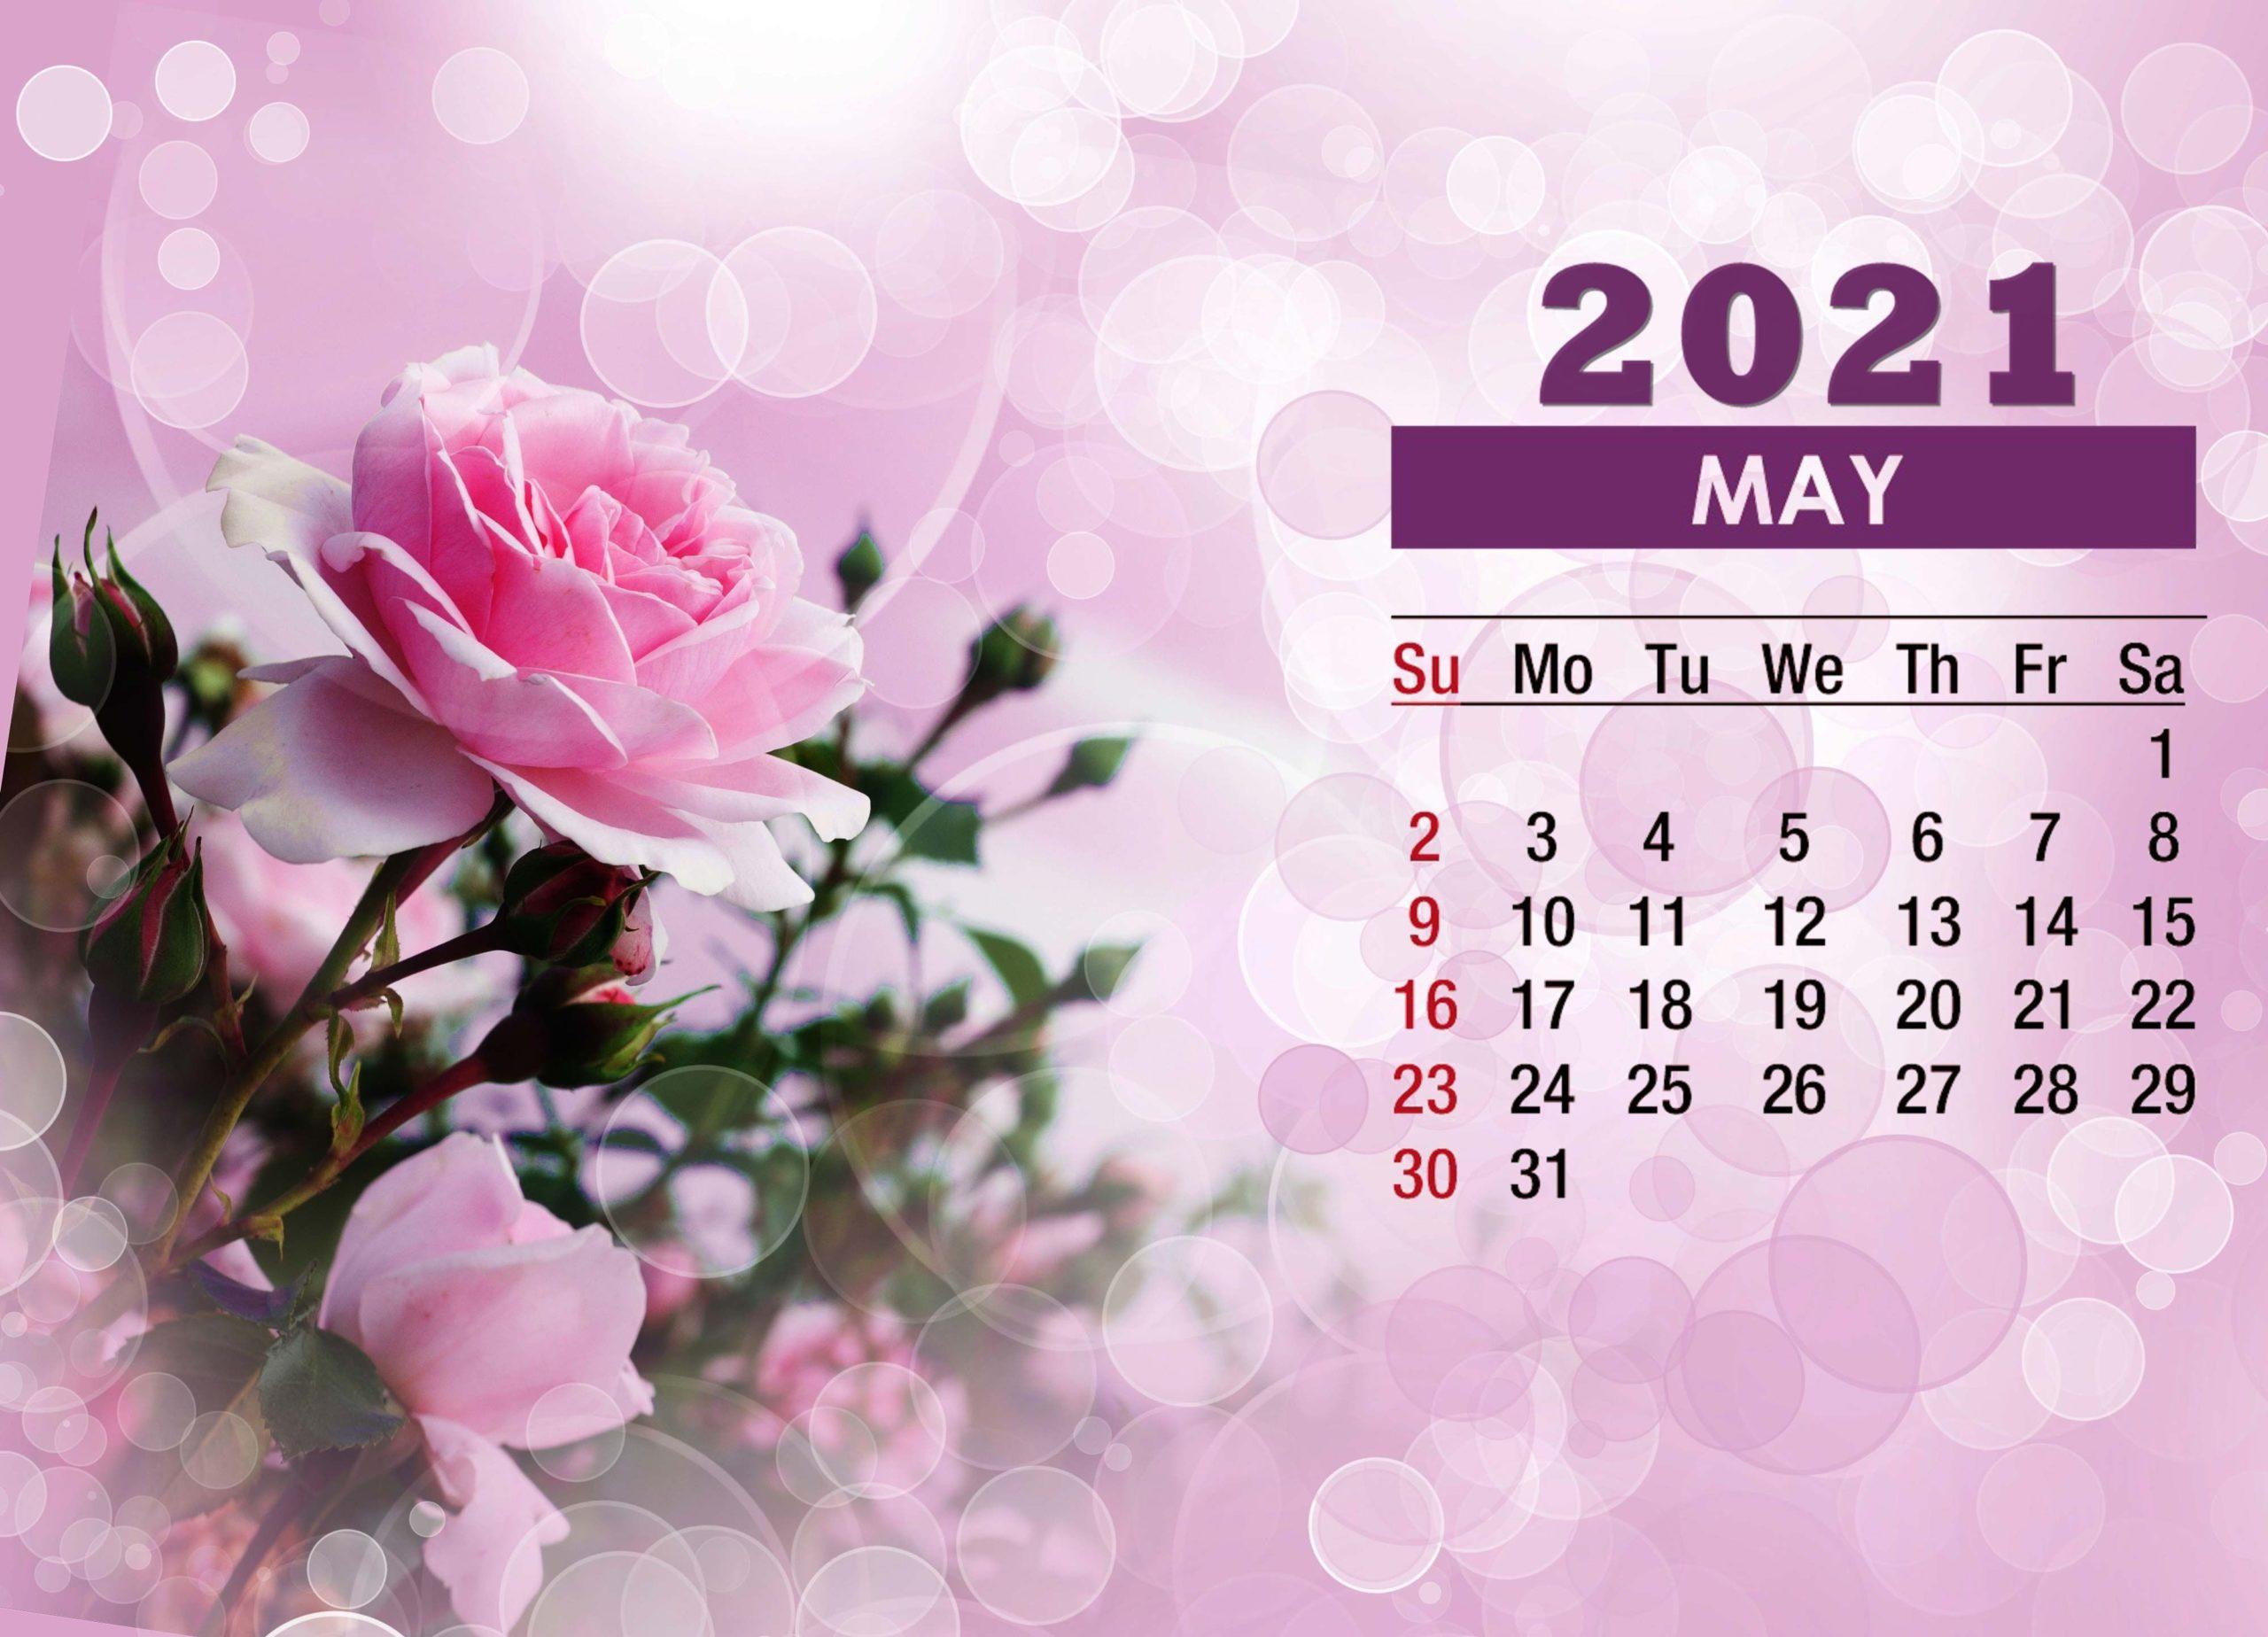 may 2021 calendar with holidays usa